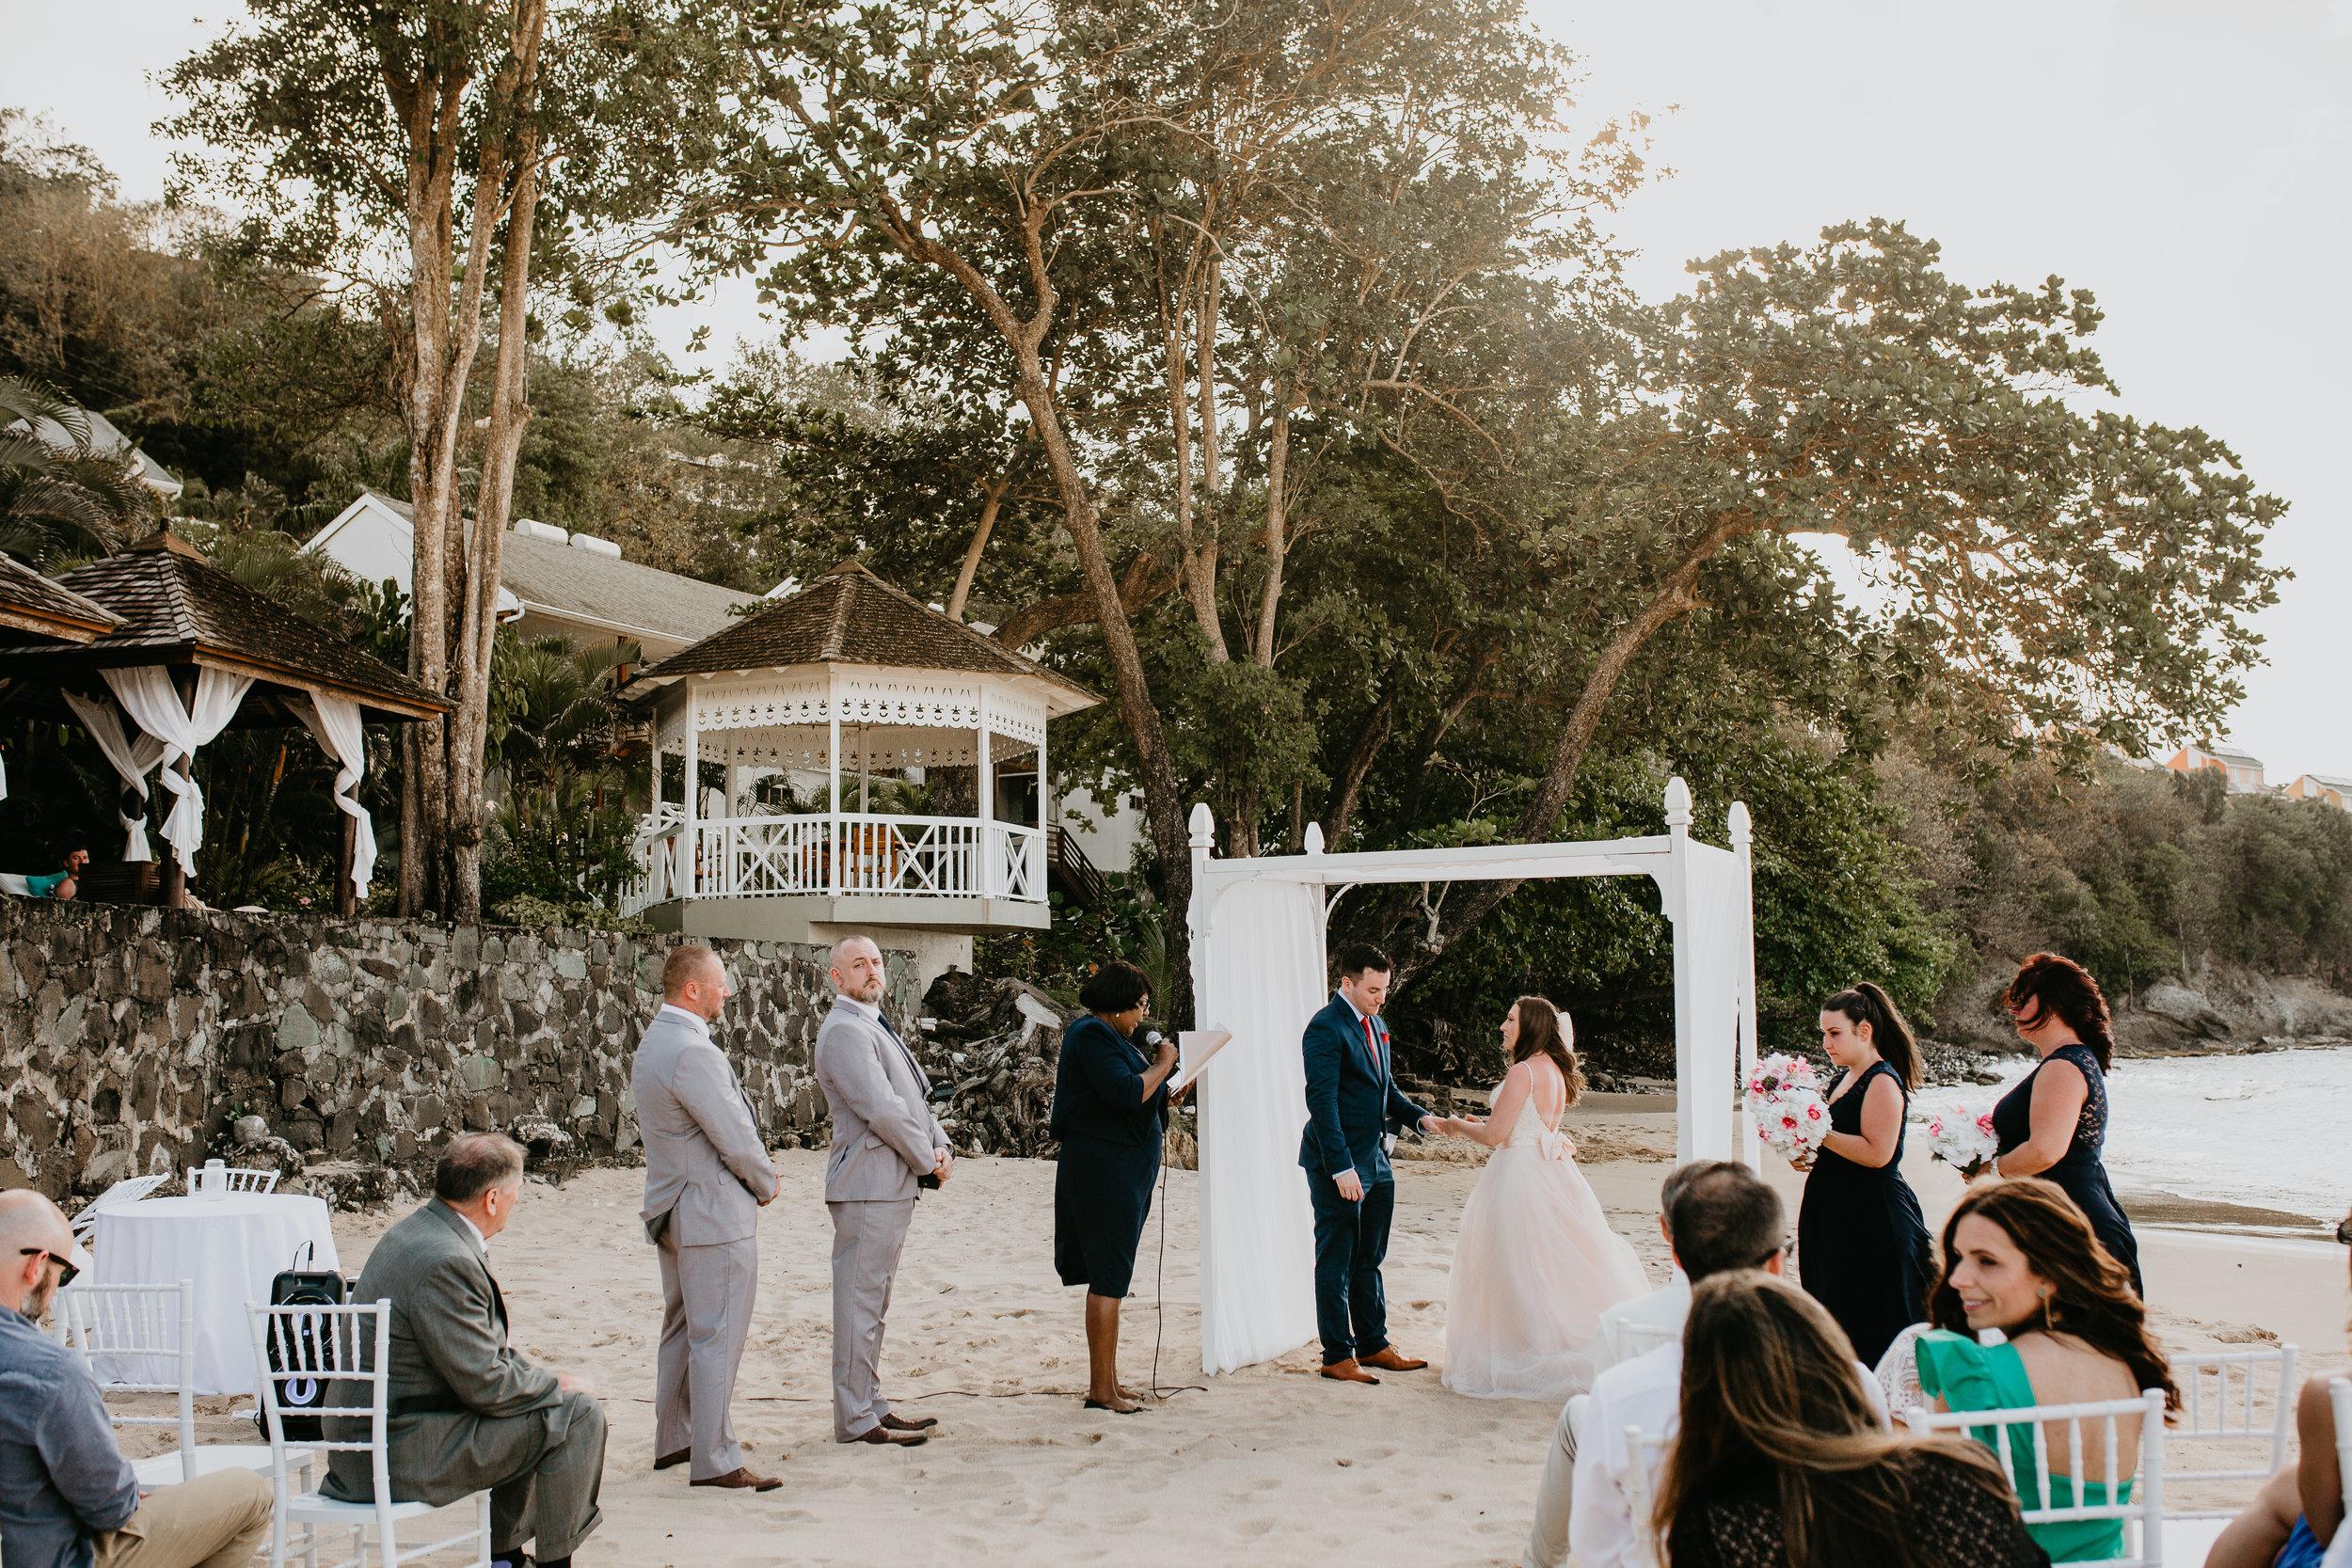 nicole-daacke-photography-destination-wedding-in-st-lucia-sandals-la-toc-intimate-island-wedding-carribean-elopement-photographer-chill-island-wedding-68.jpg